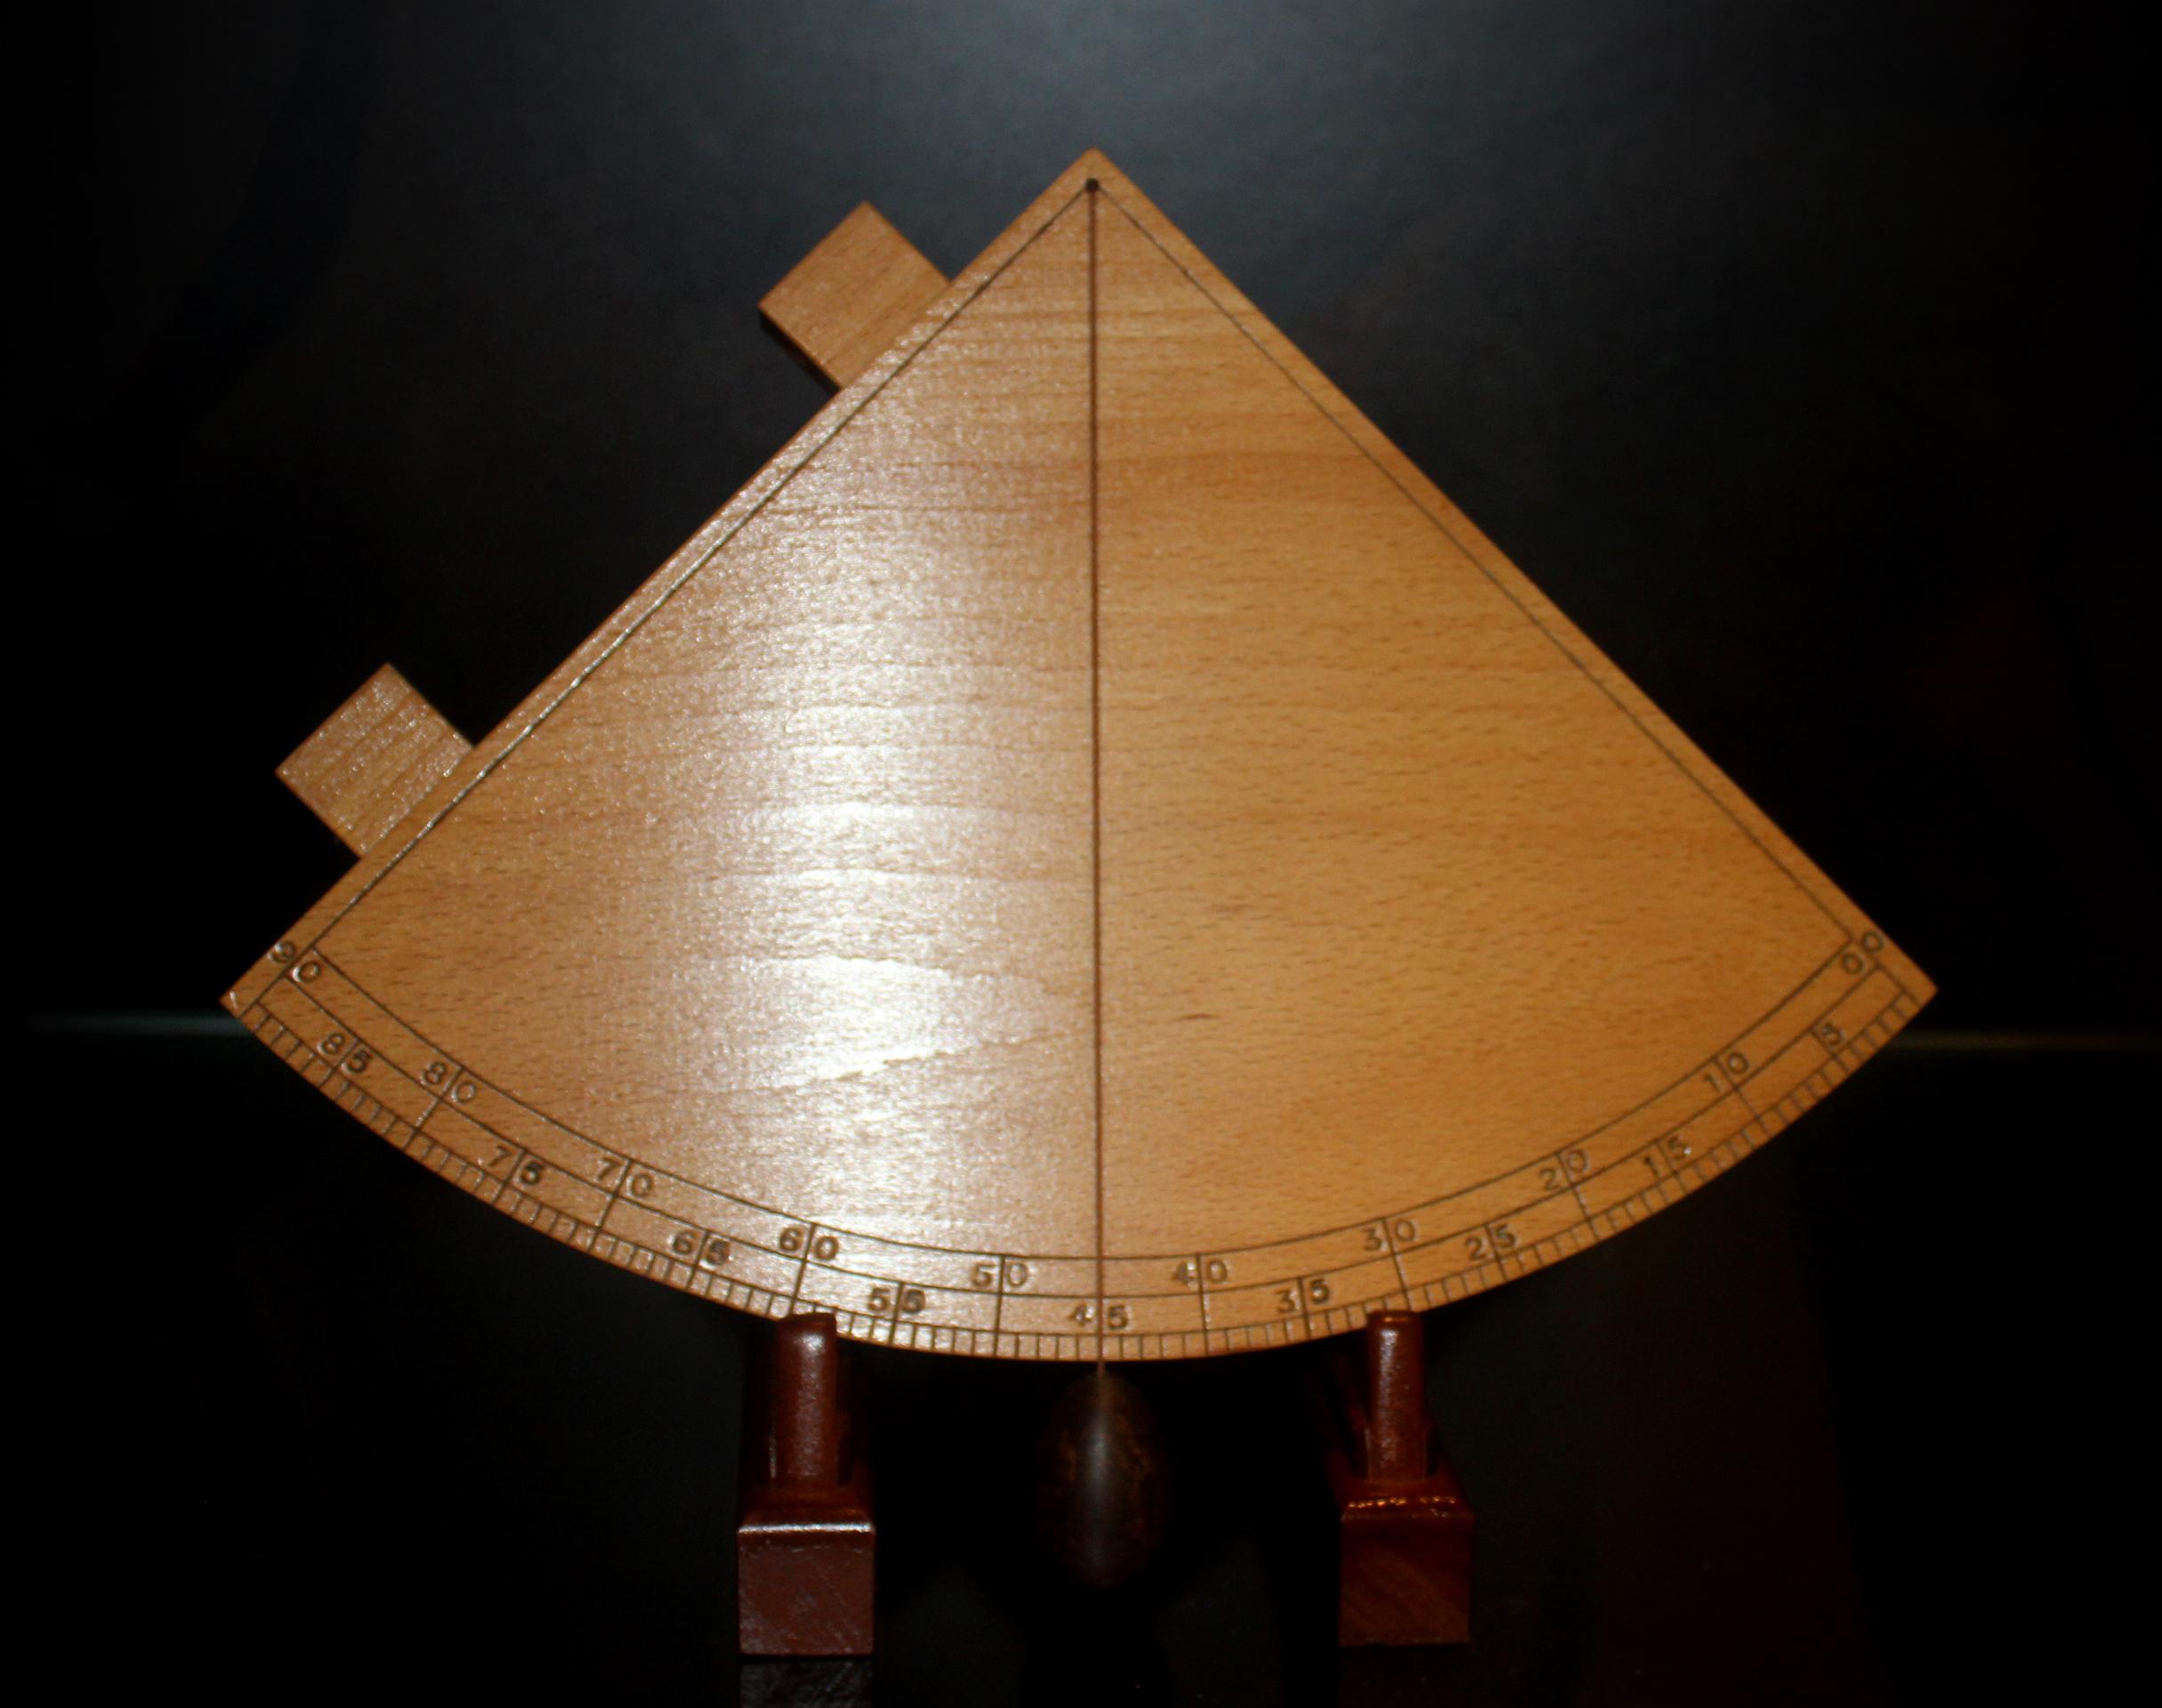 16th-century portuguese nautical sextant - european age of discovery photo